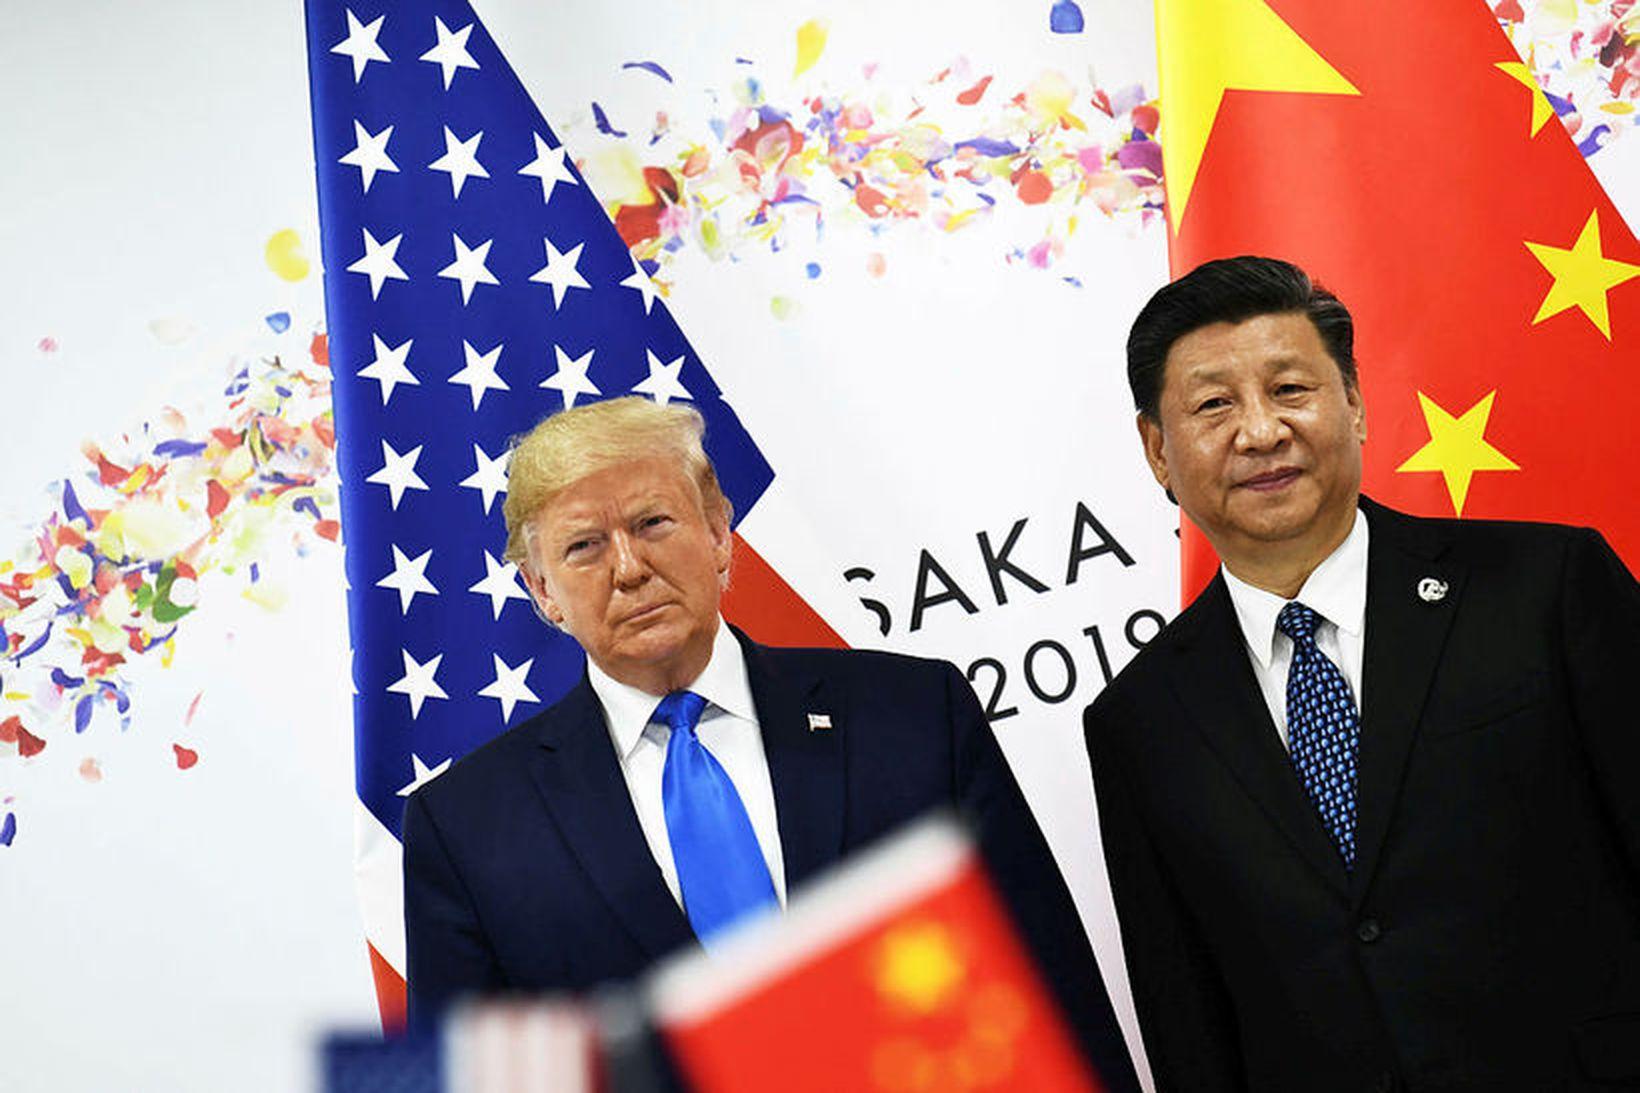 Donald Trump Bandaríkjaforseti og Xi Jinping Kínaforseti.